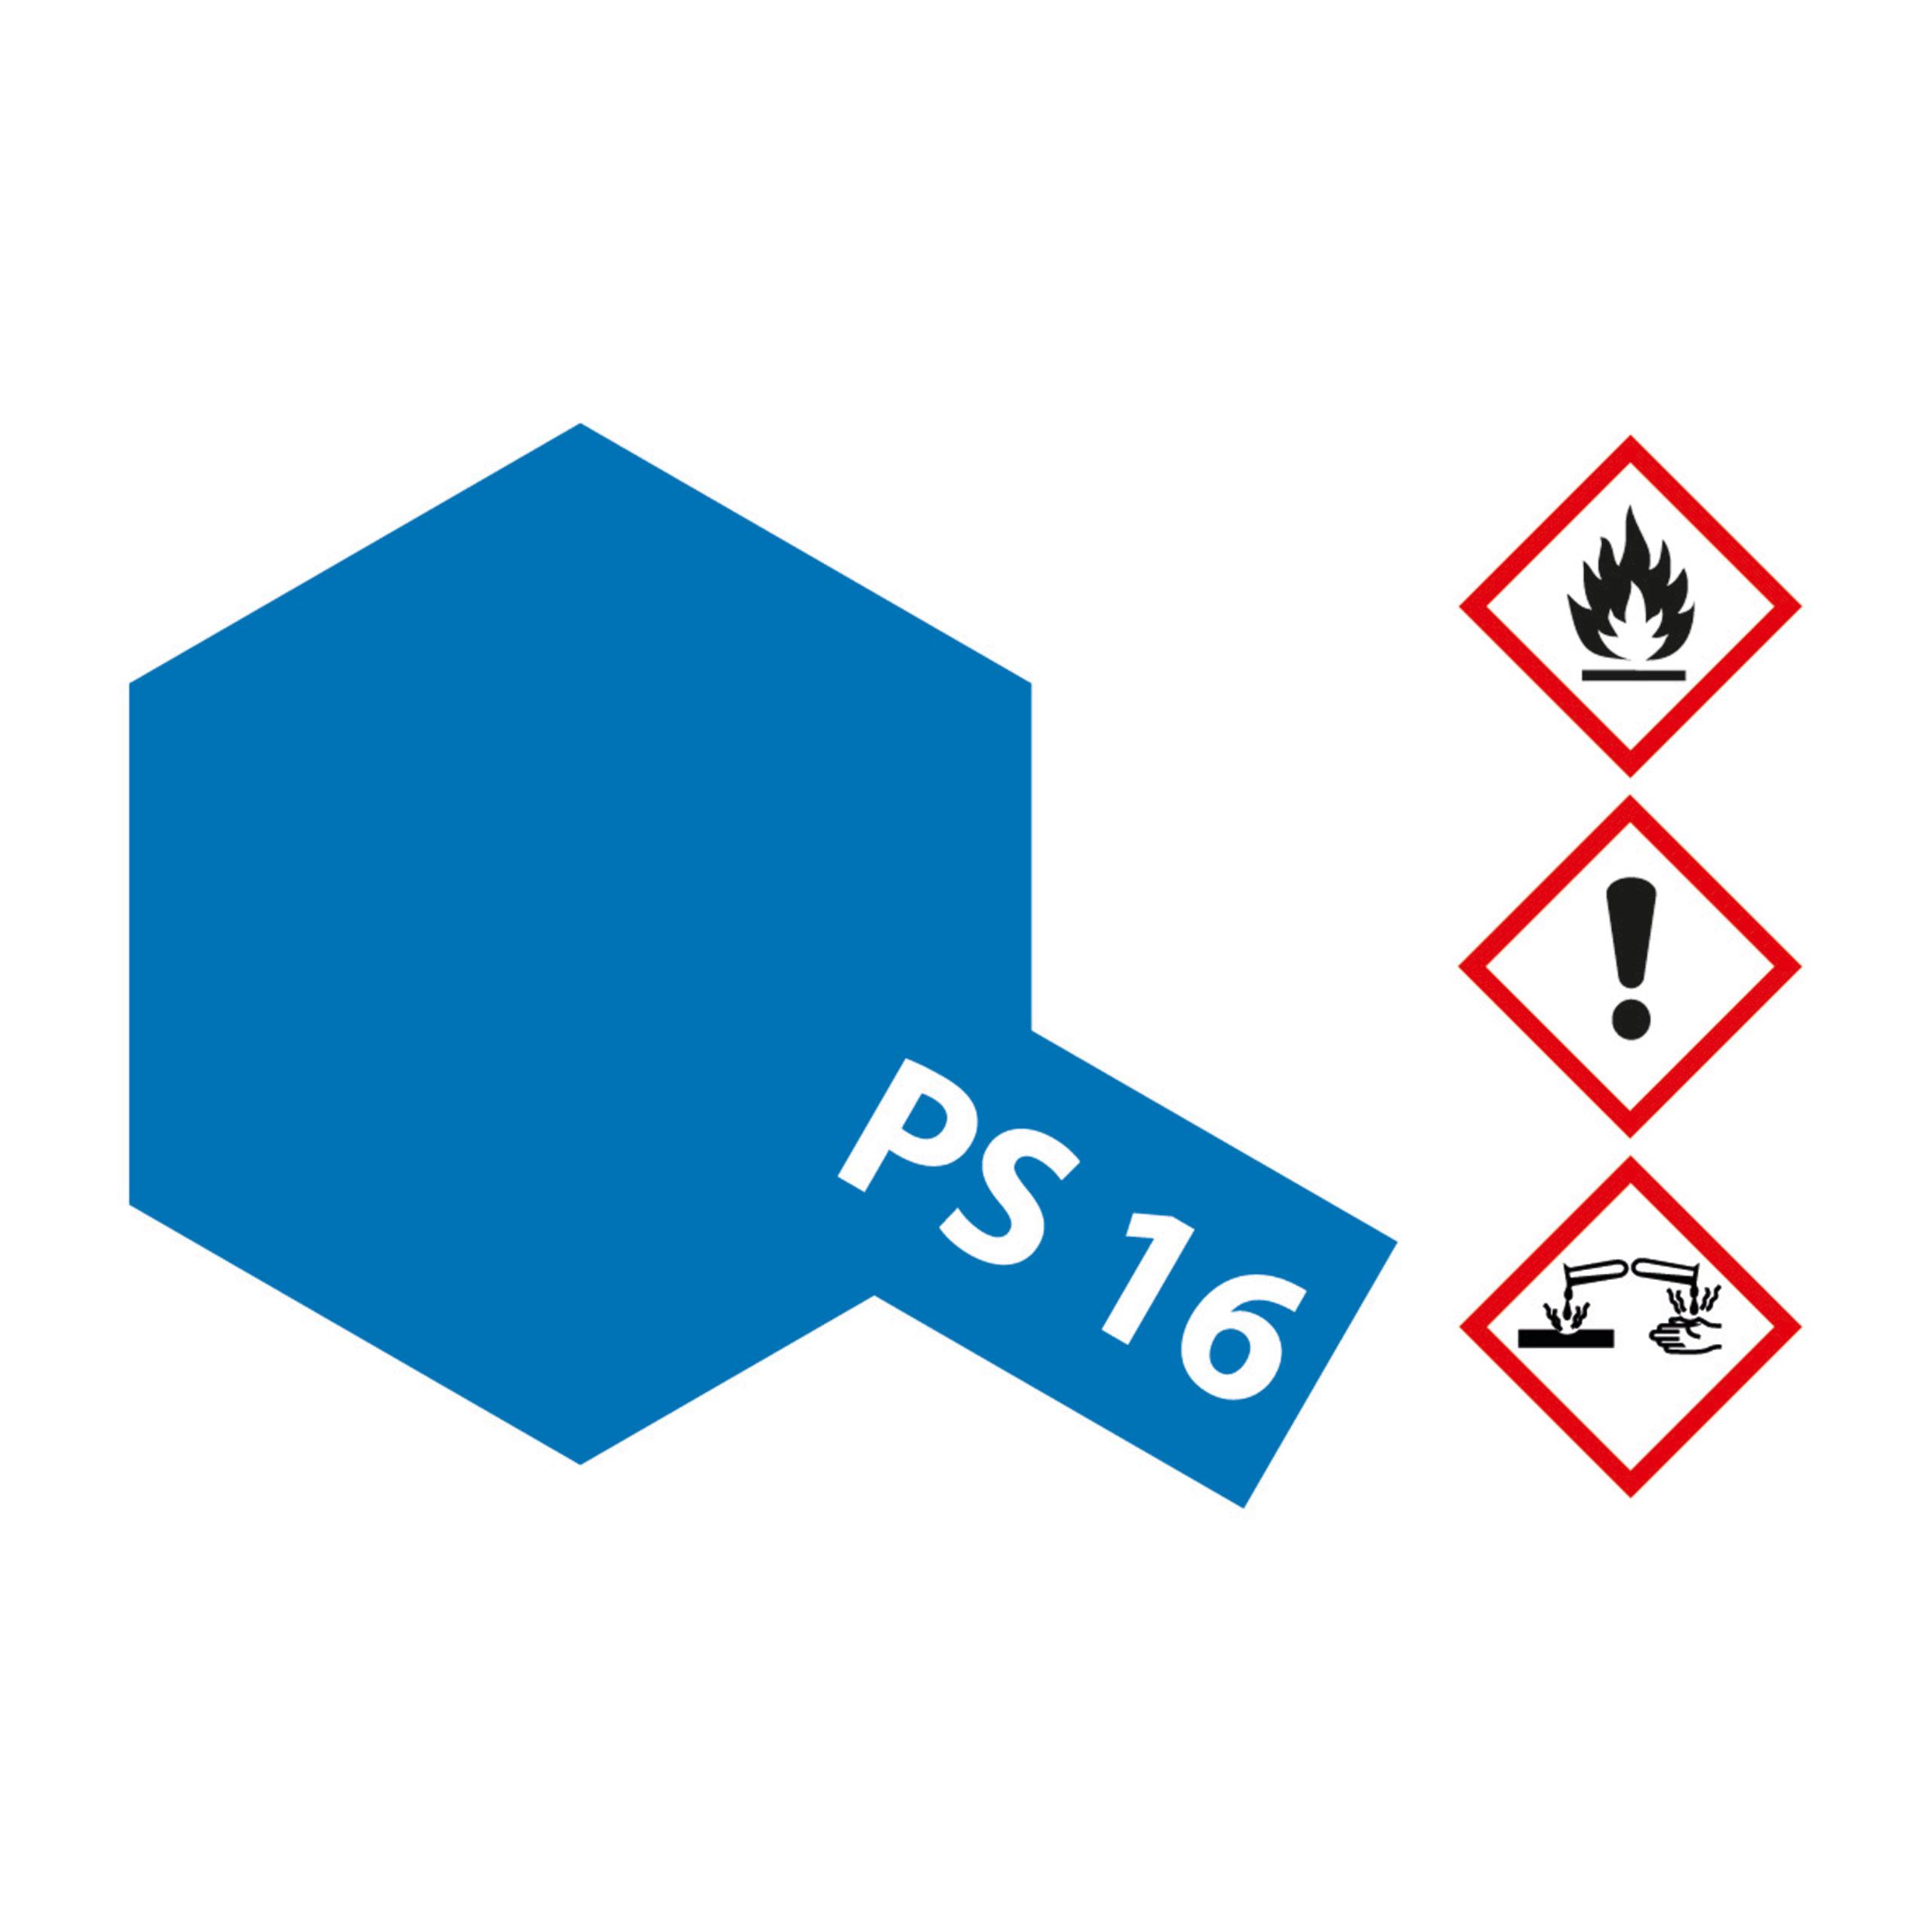 PS-16 Metallic Blau Polycarbonat - 100ml Sprayfarbe Lexan - Tamiya 300086016